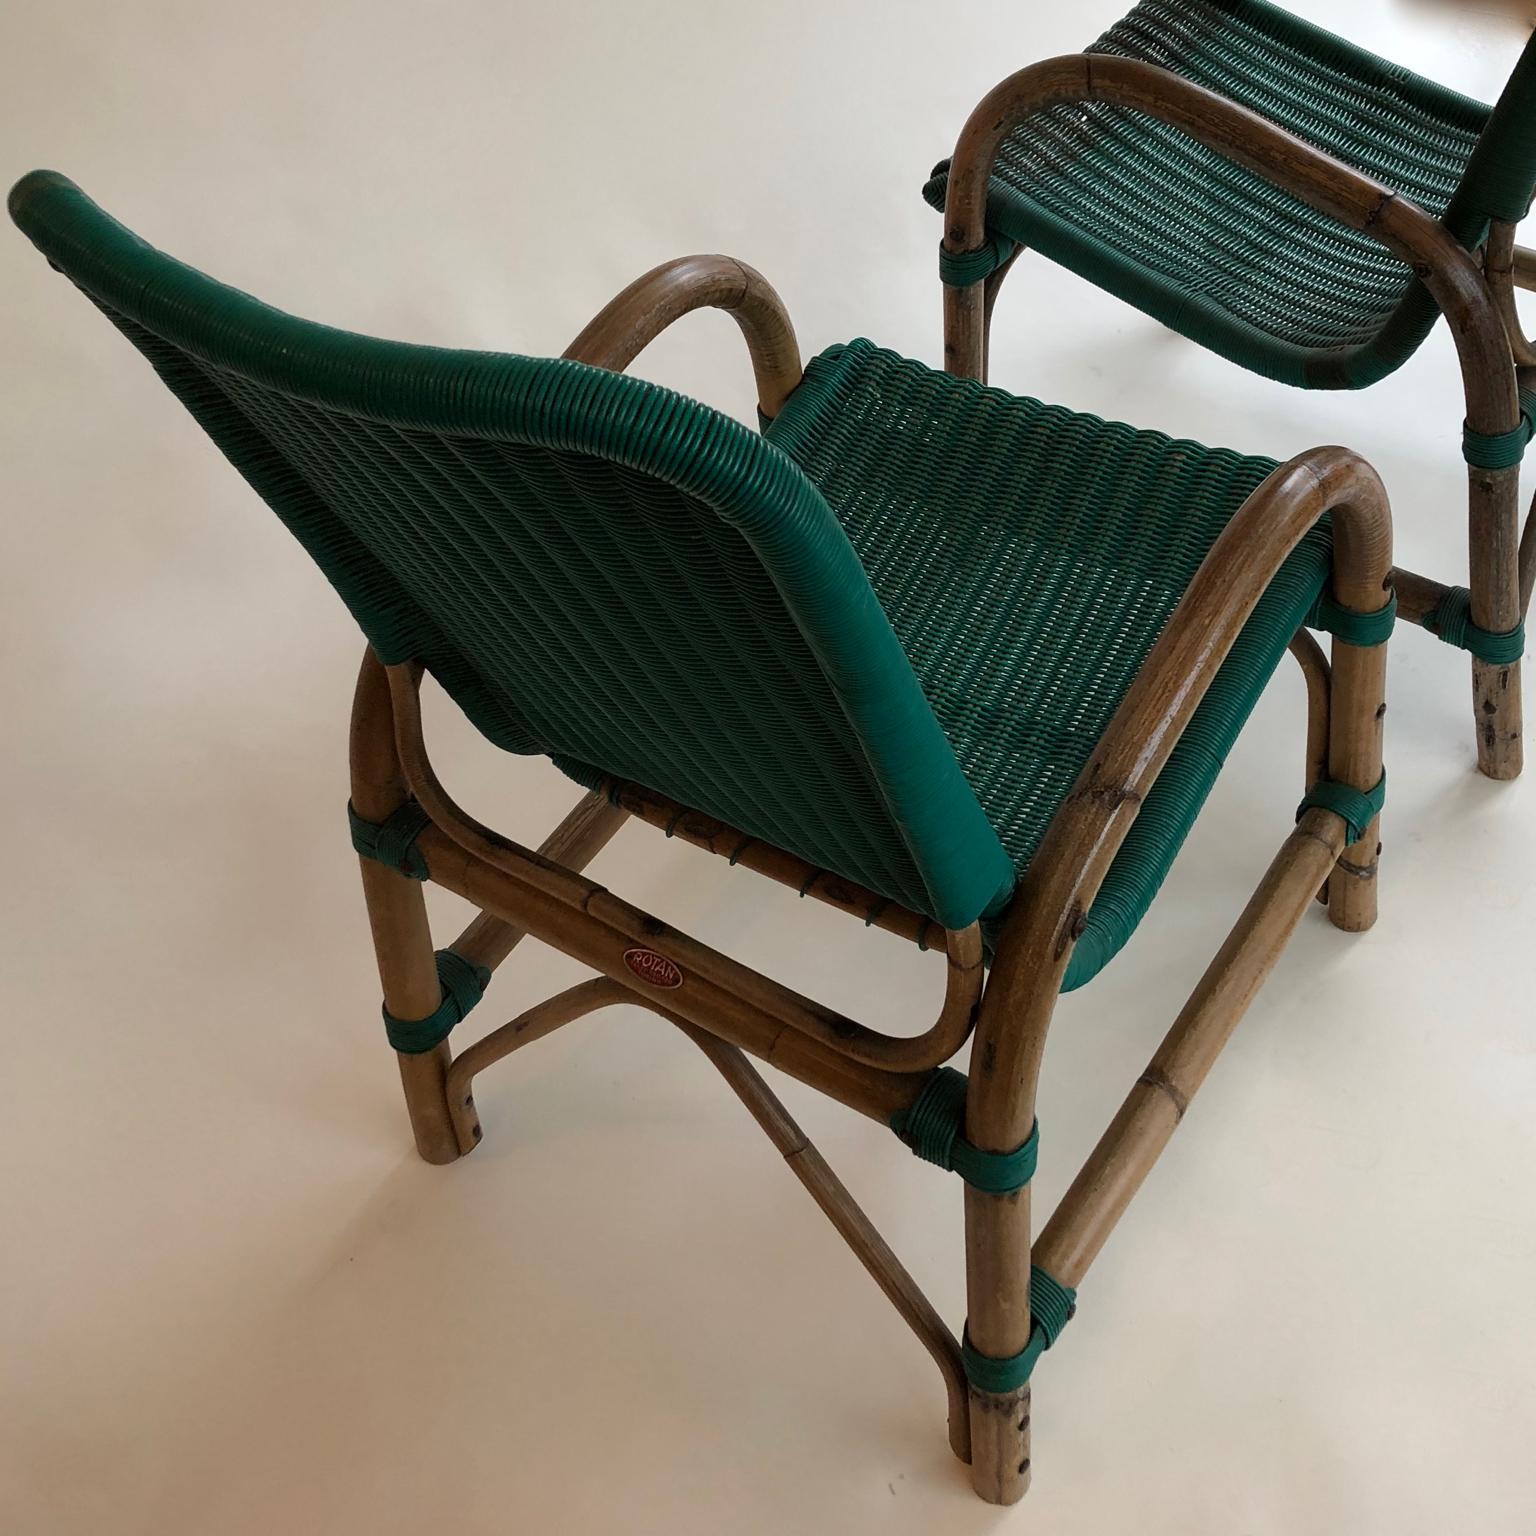 Egg Chair Rotan.Bamboo Armchairs With Green Seats Circa 1960s A Pair By Rotan